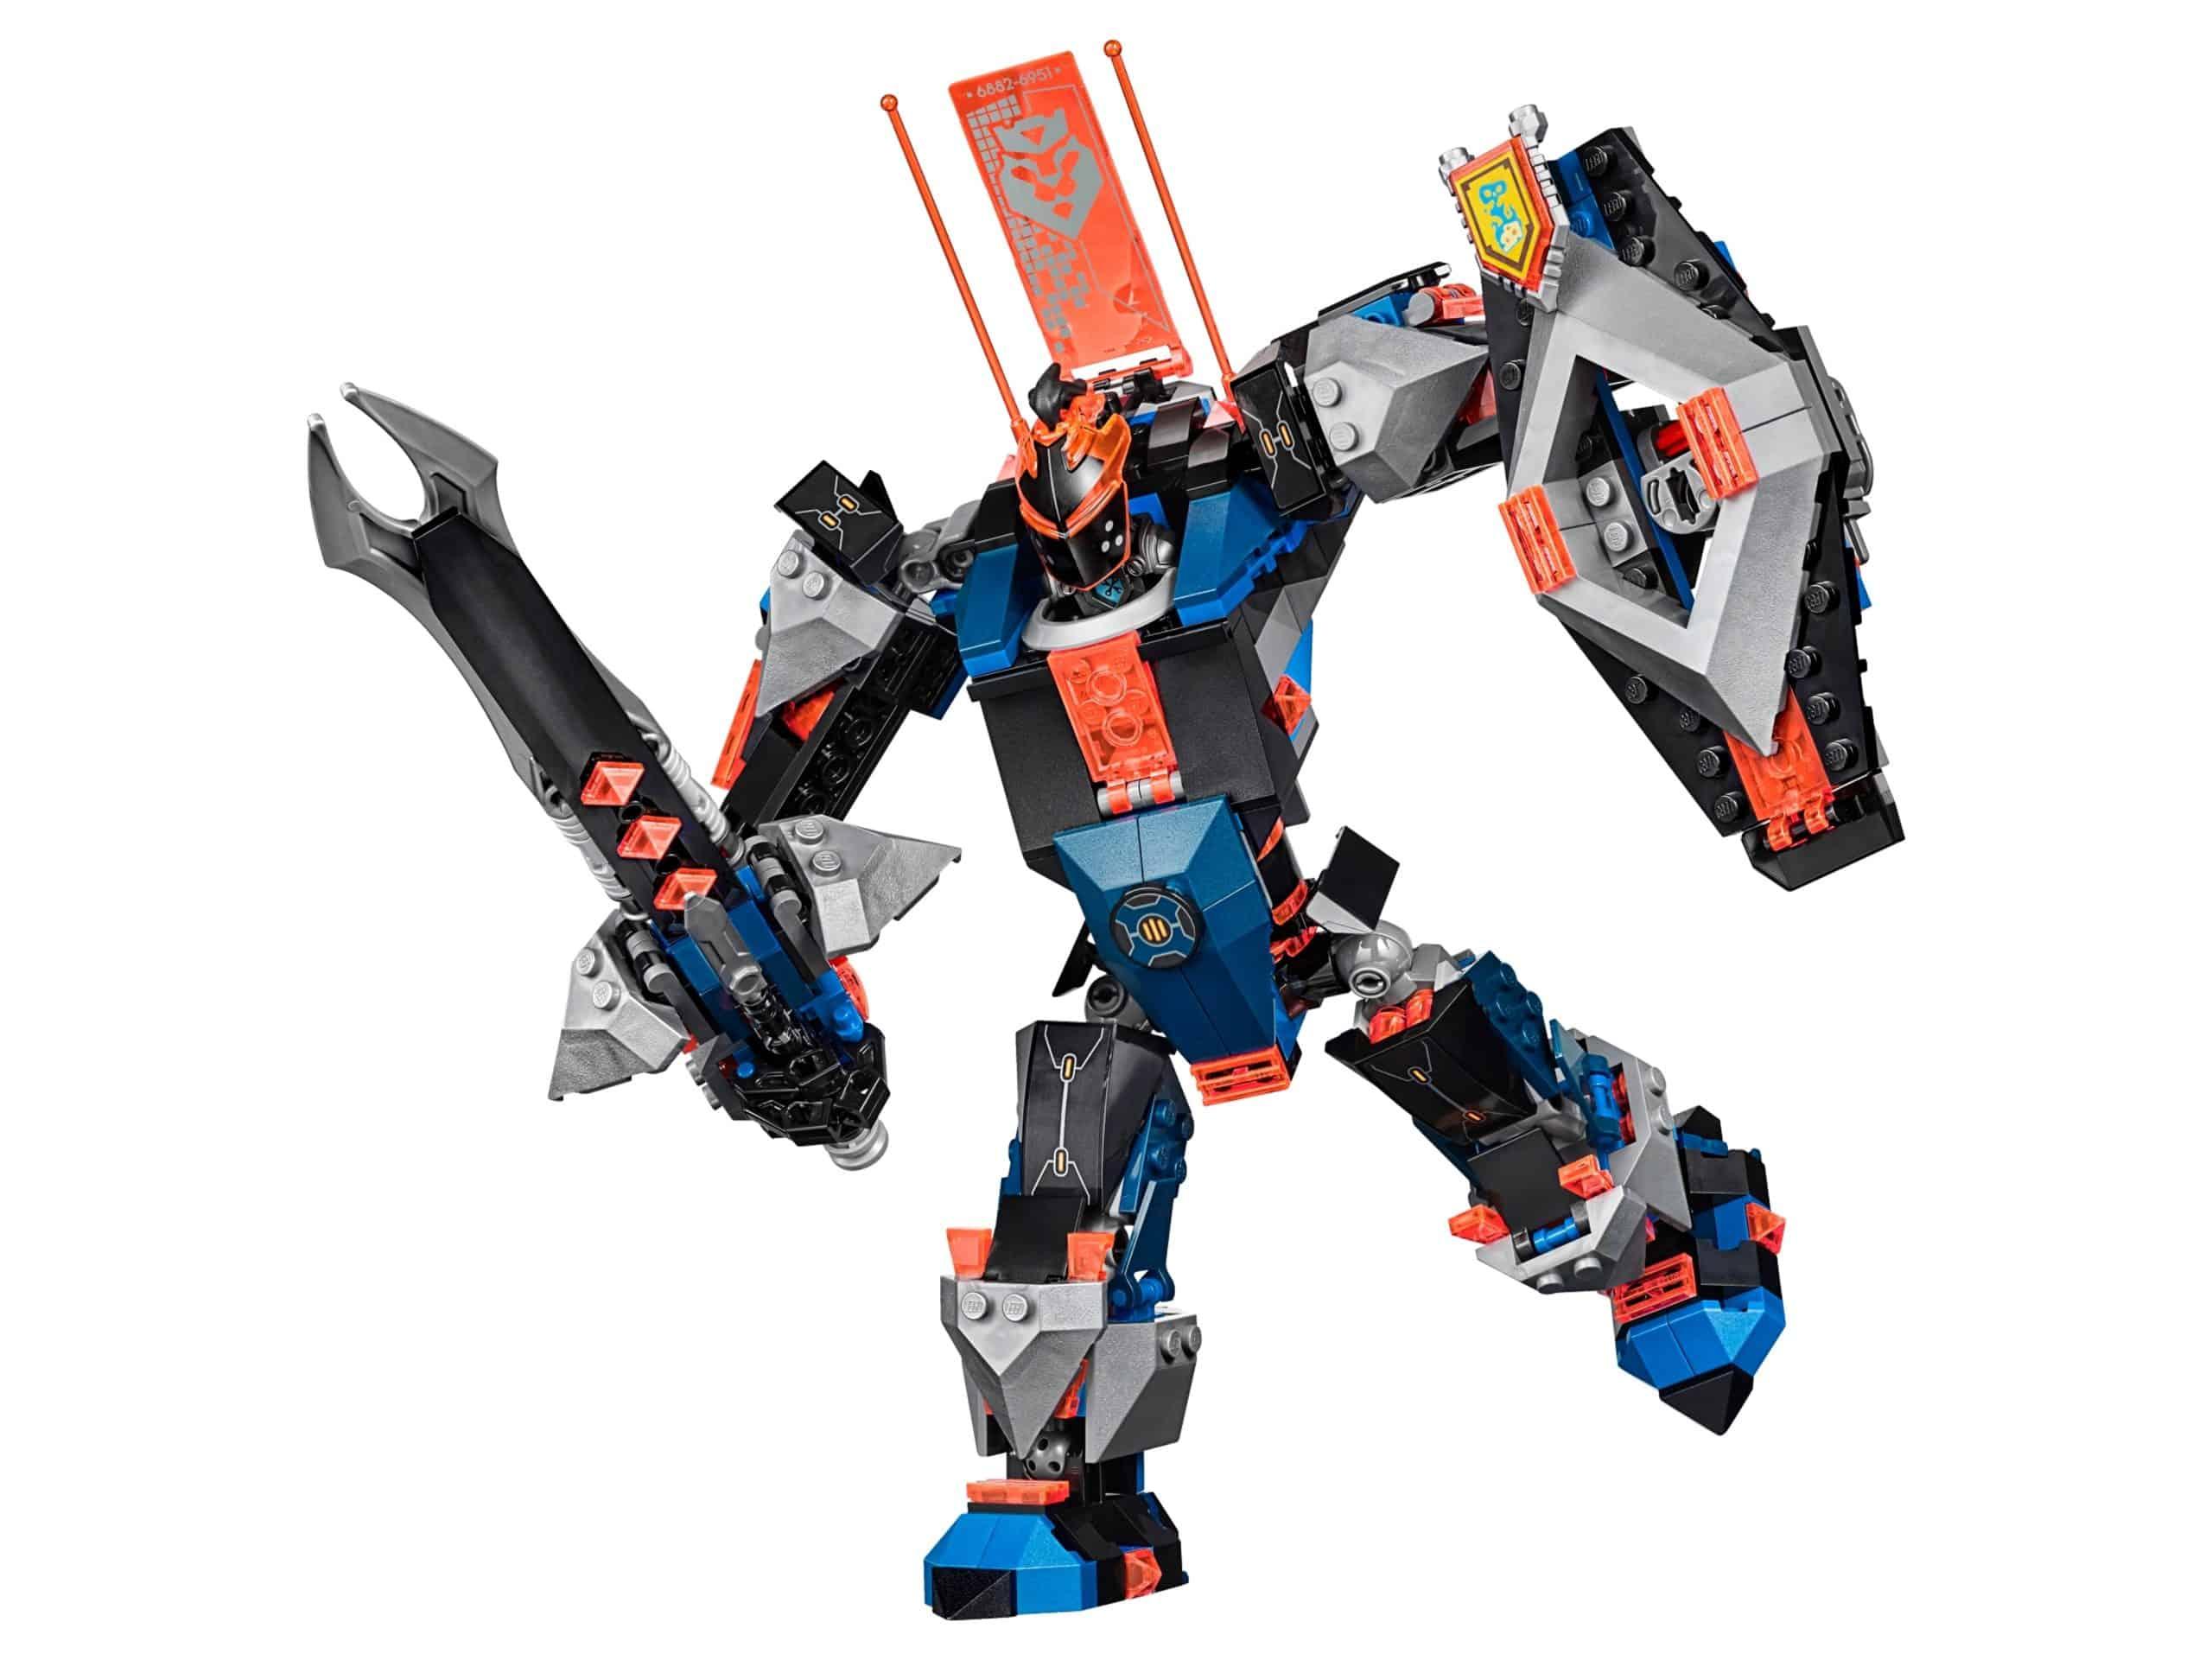 lego 70326 den sorte ridderrobot scaled